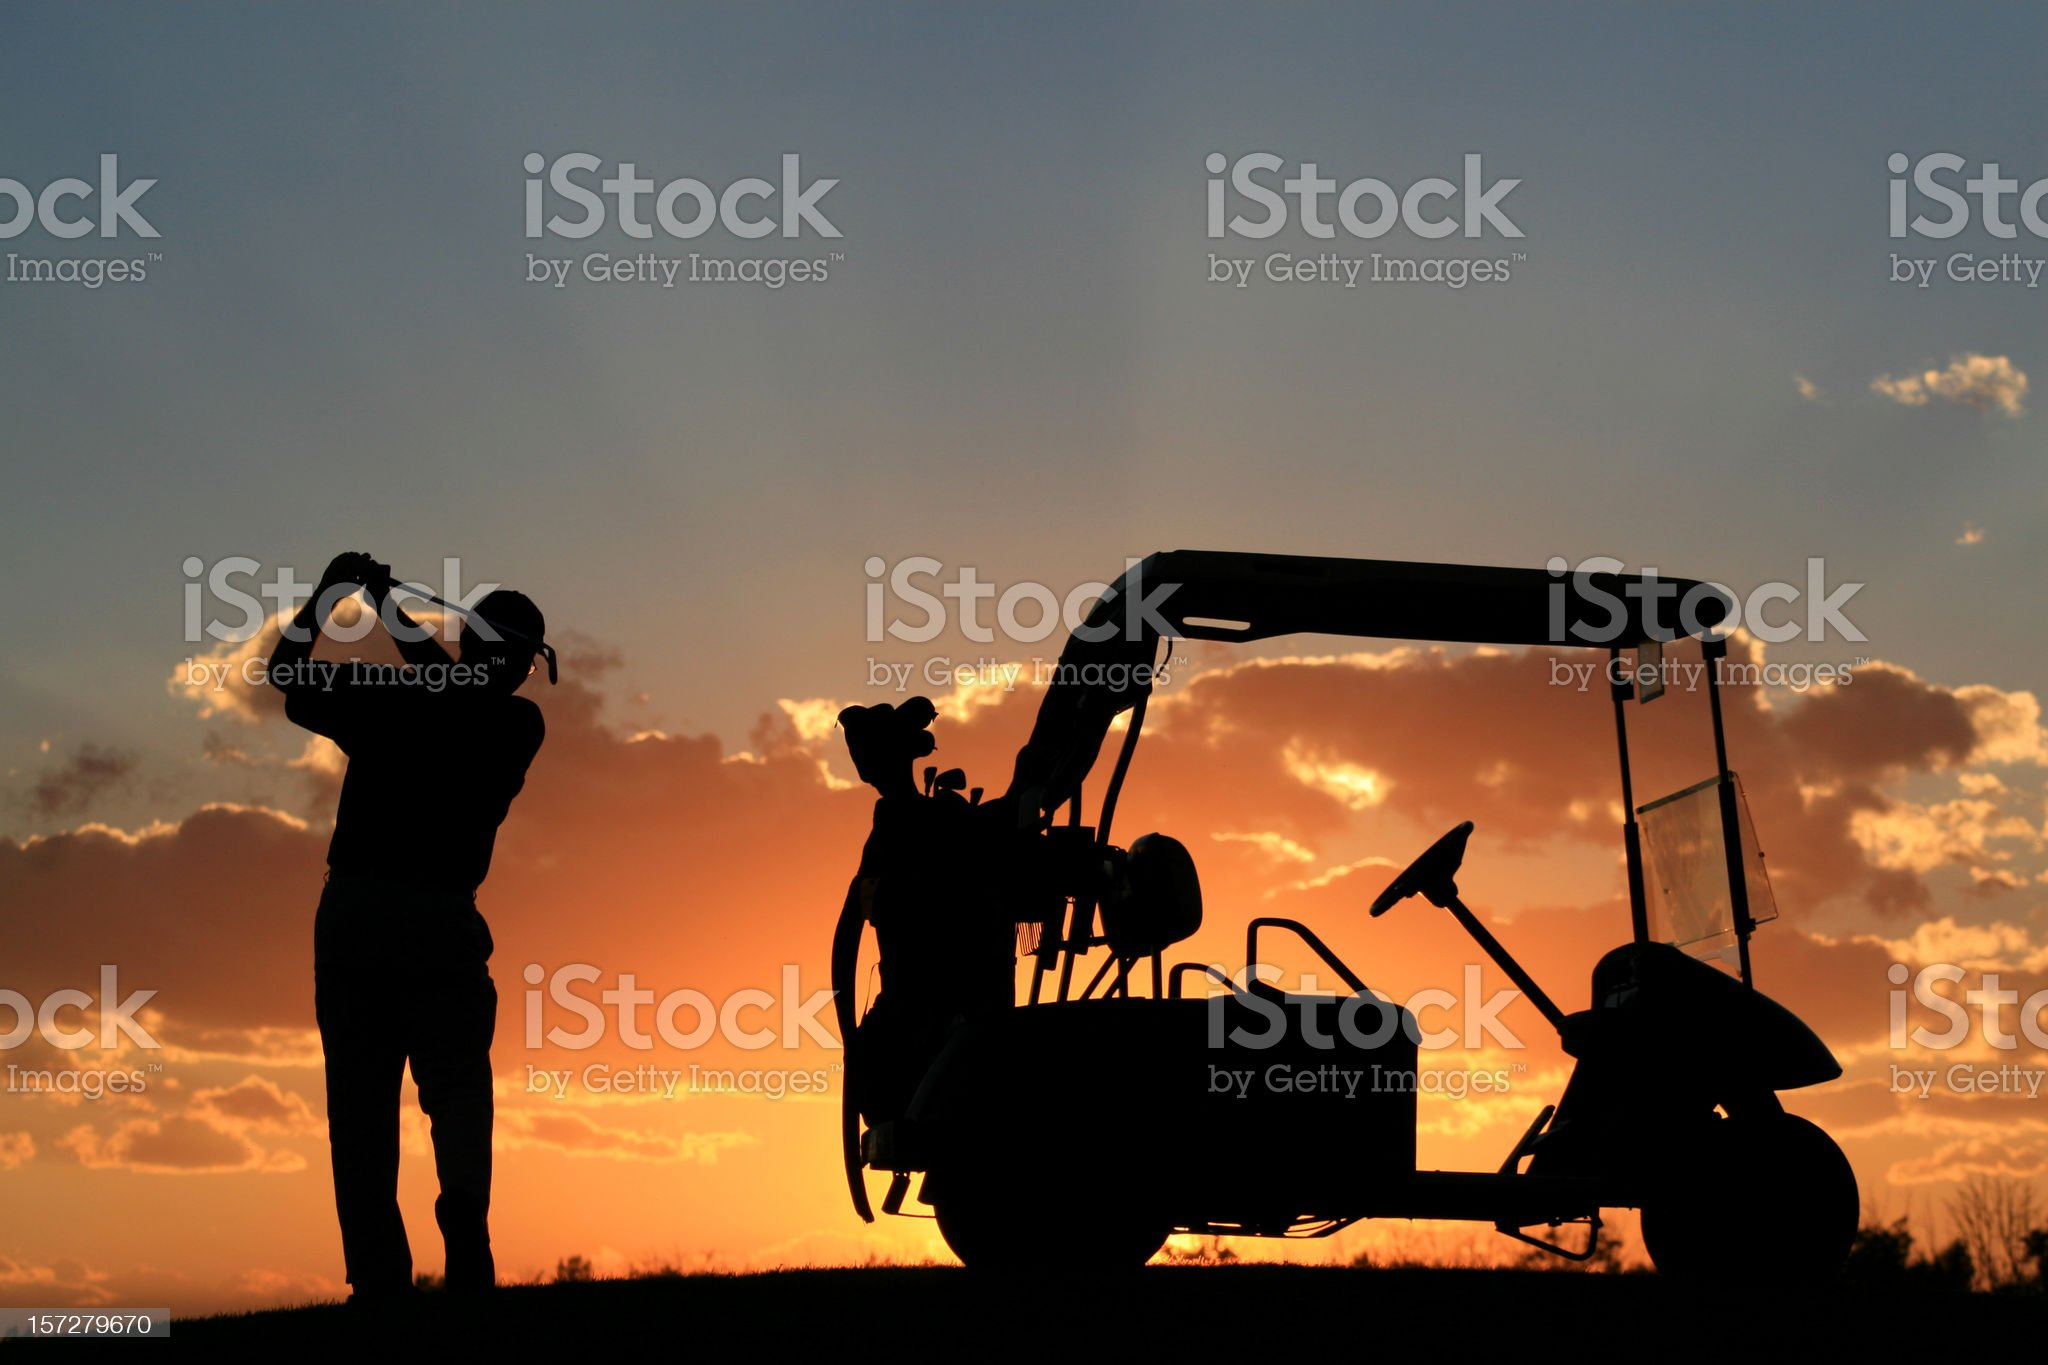 Senior Golfer Silhouette royalty-free stock photo